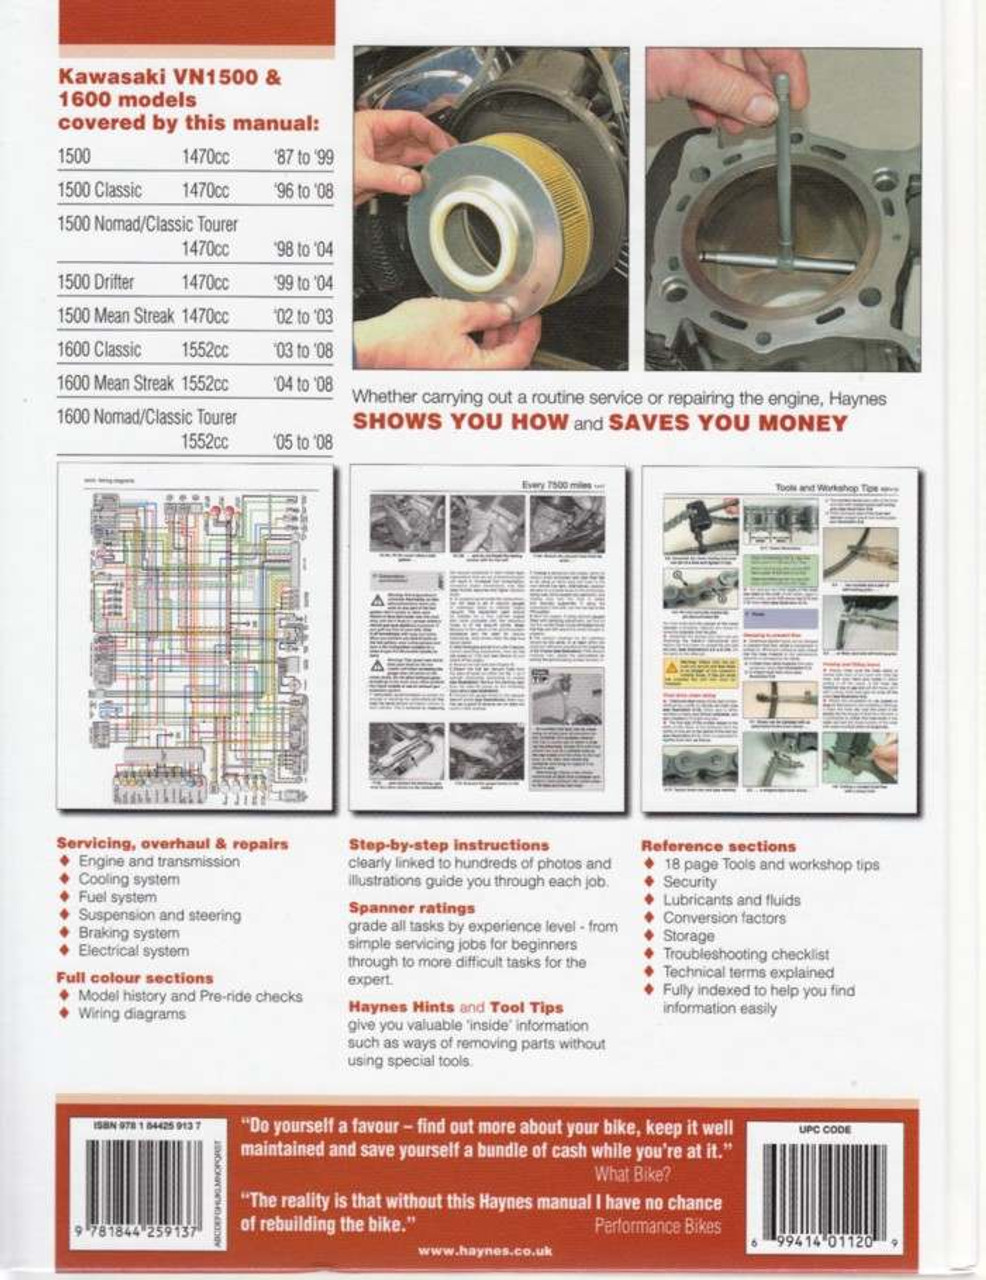 Kawasaki Vulcan 1500 1600 1987 2008 Workshop Manualrhautomotobookshopau: 1996 Kawasaki Vulcan 1500 Wiring Diagram At Gmaili.net